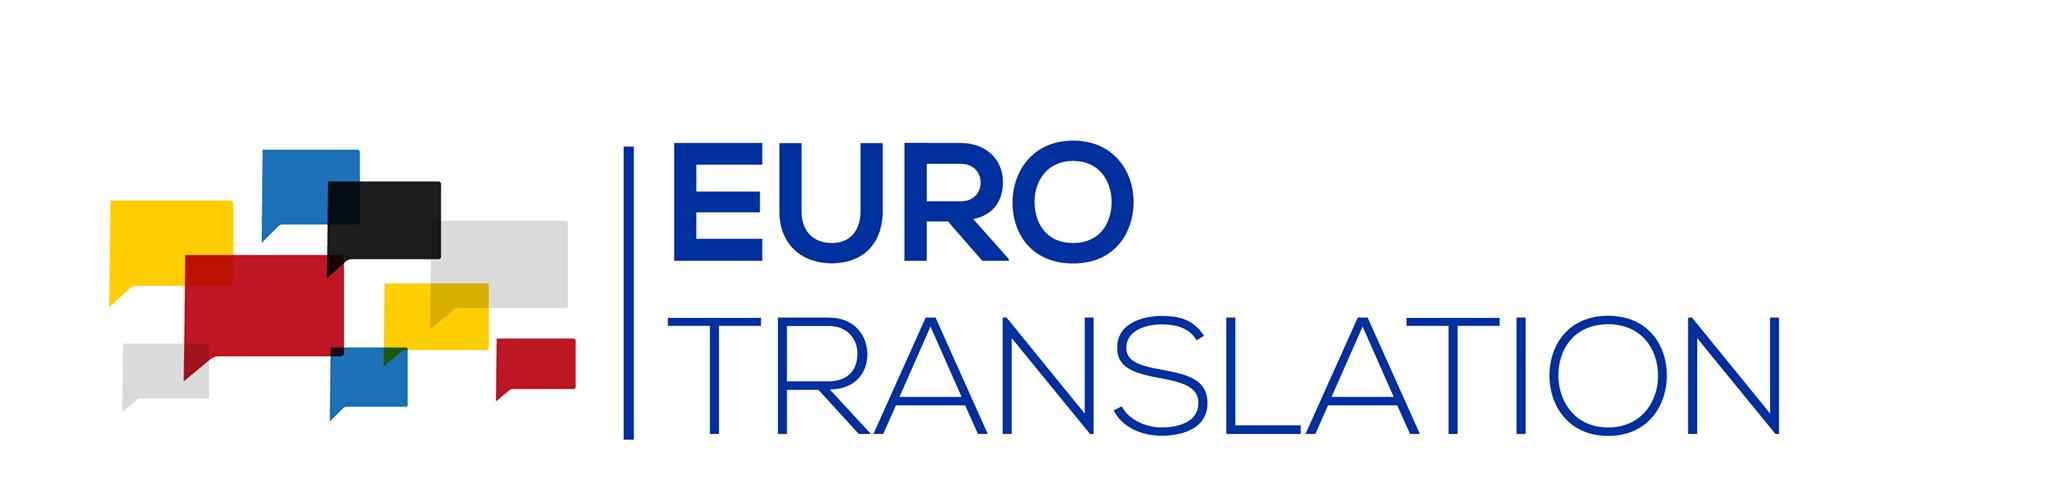 Euro Translation, Lda